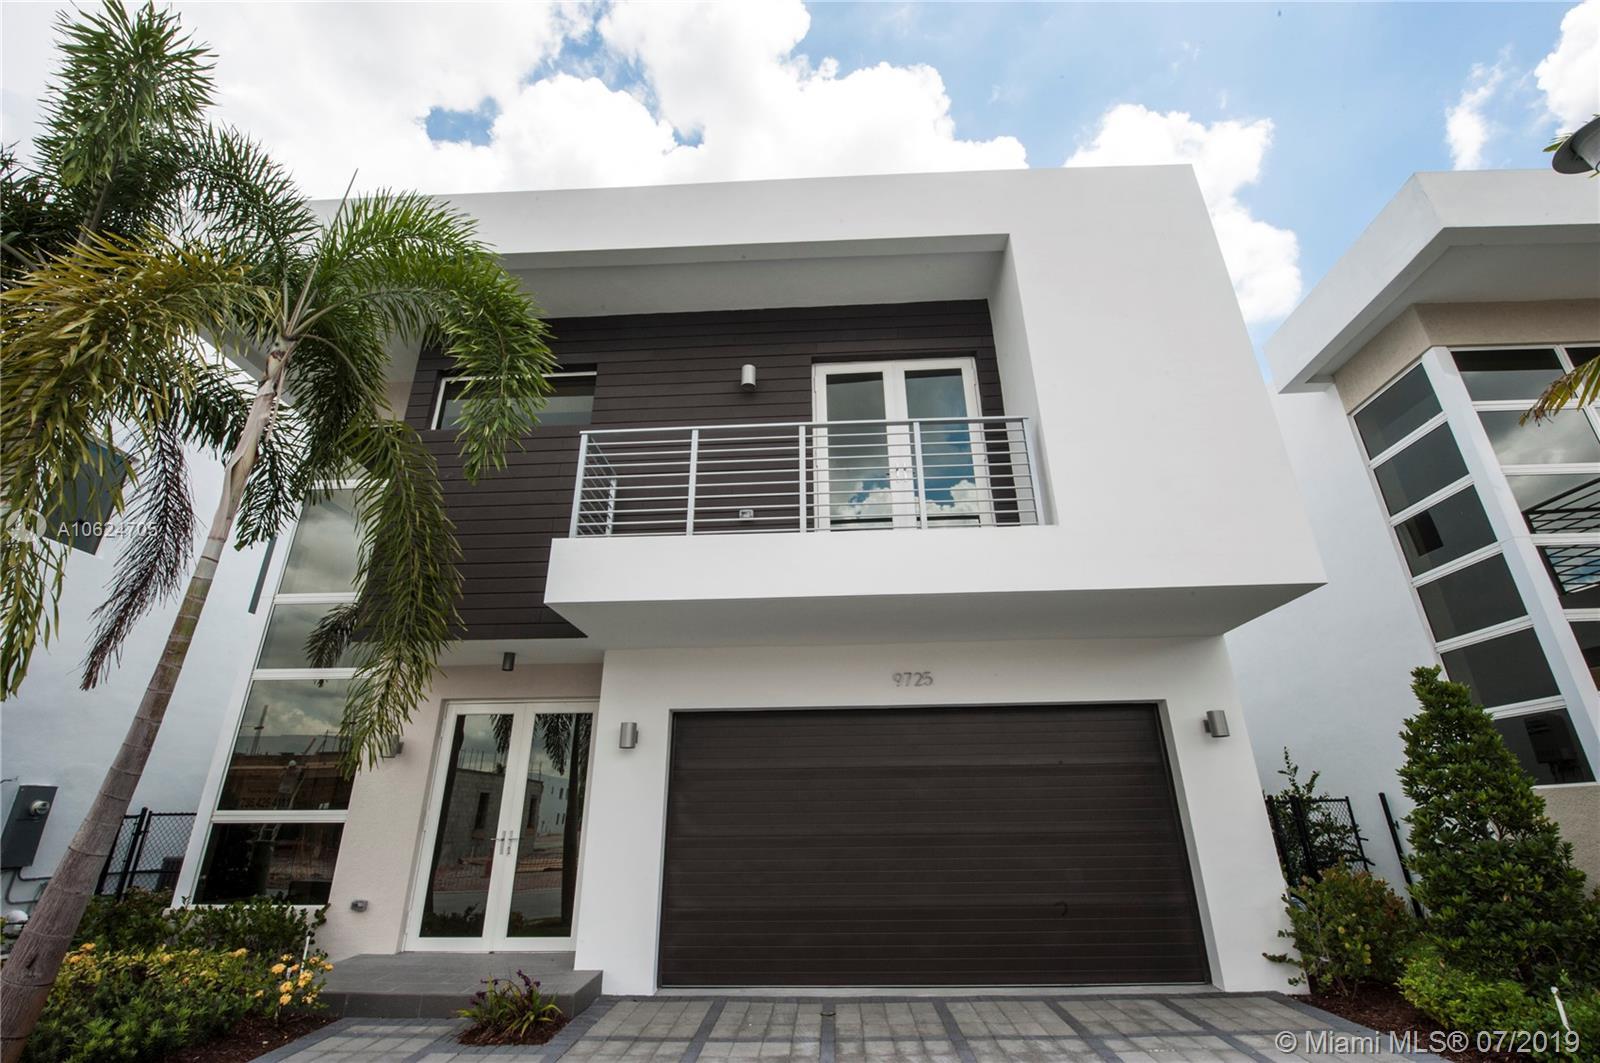 9725 NW 75 Te, Doral, FL 33178 - Doral, FL real estate listing